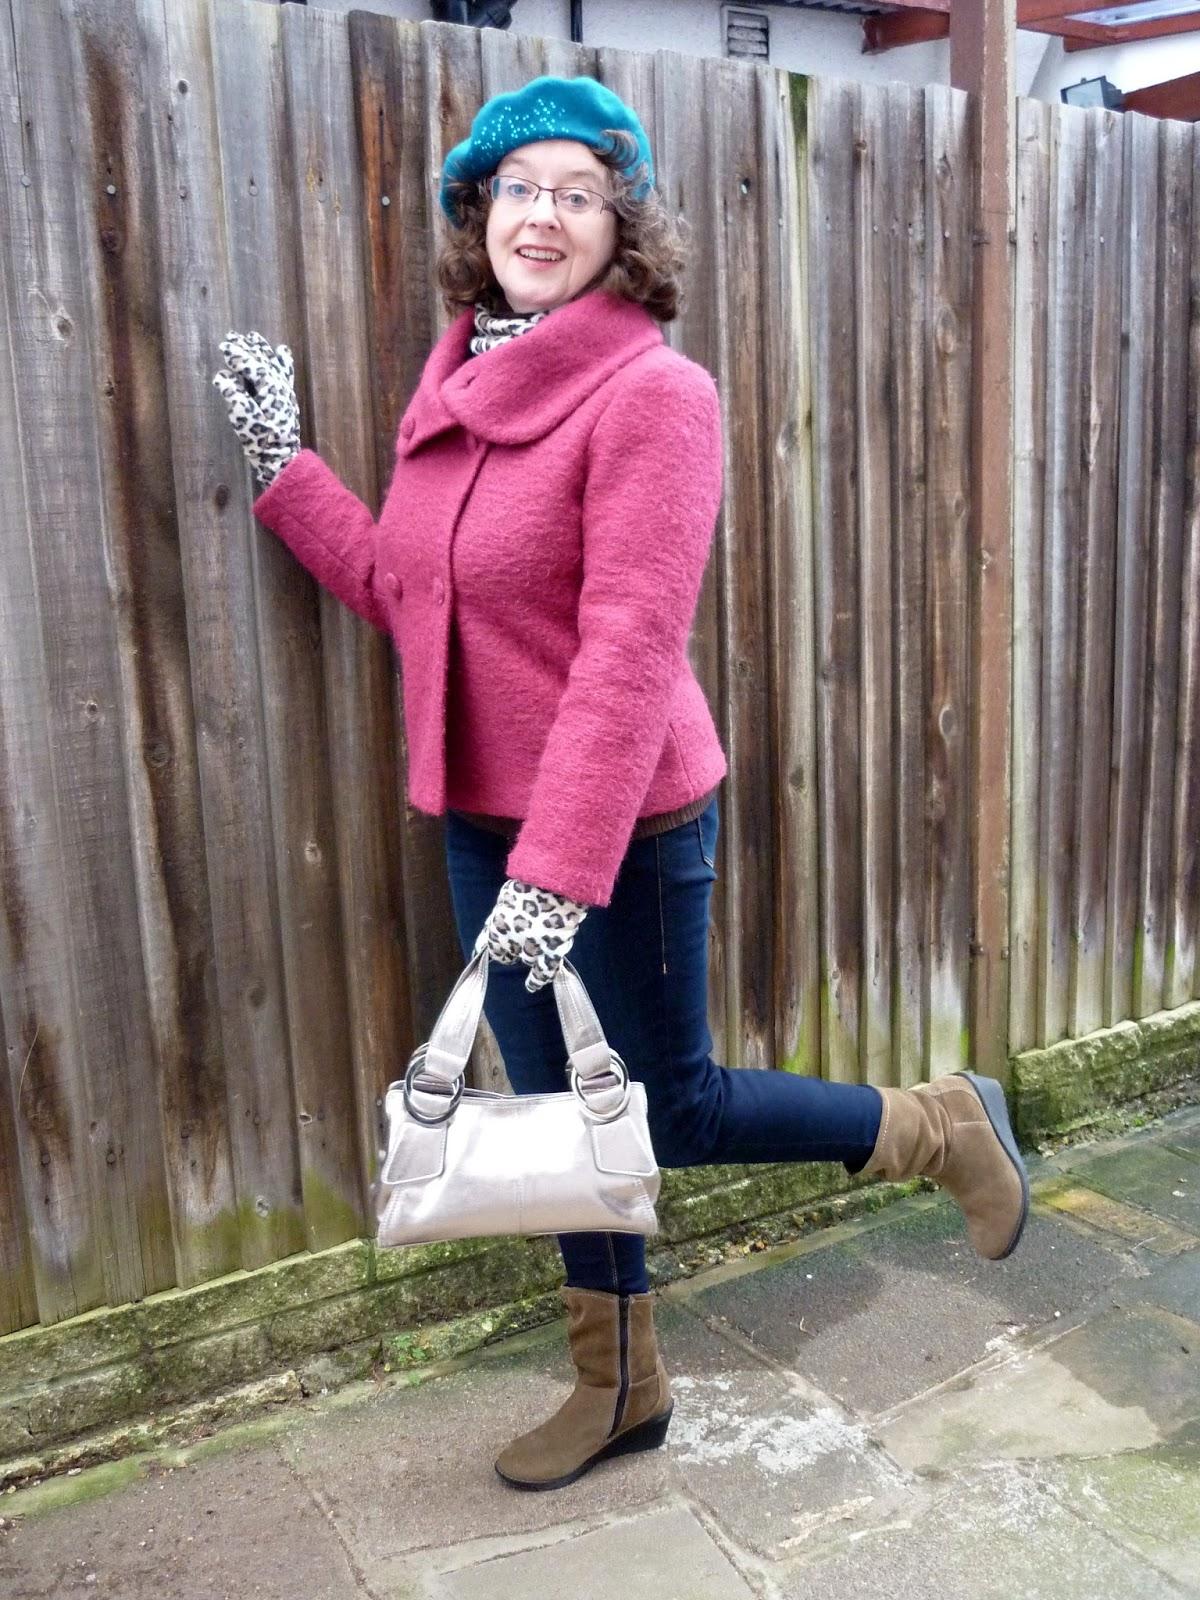 Minuet Raspberry Wool Jacket, Dorothy Perkins Petite Jeans, Leopard Print Scarf & Gloves | Petite Silver Vixen